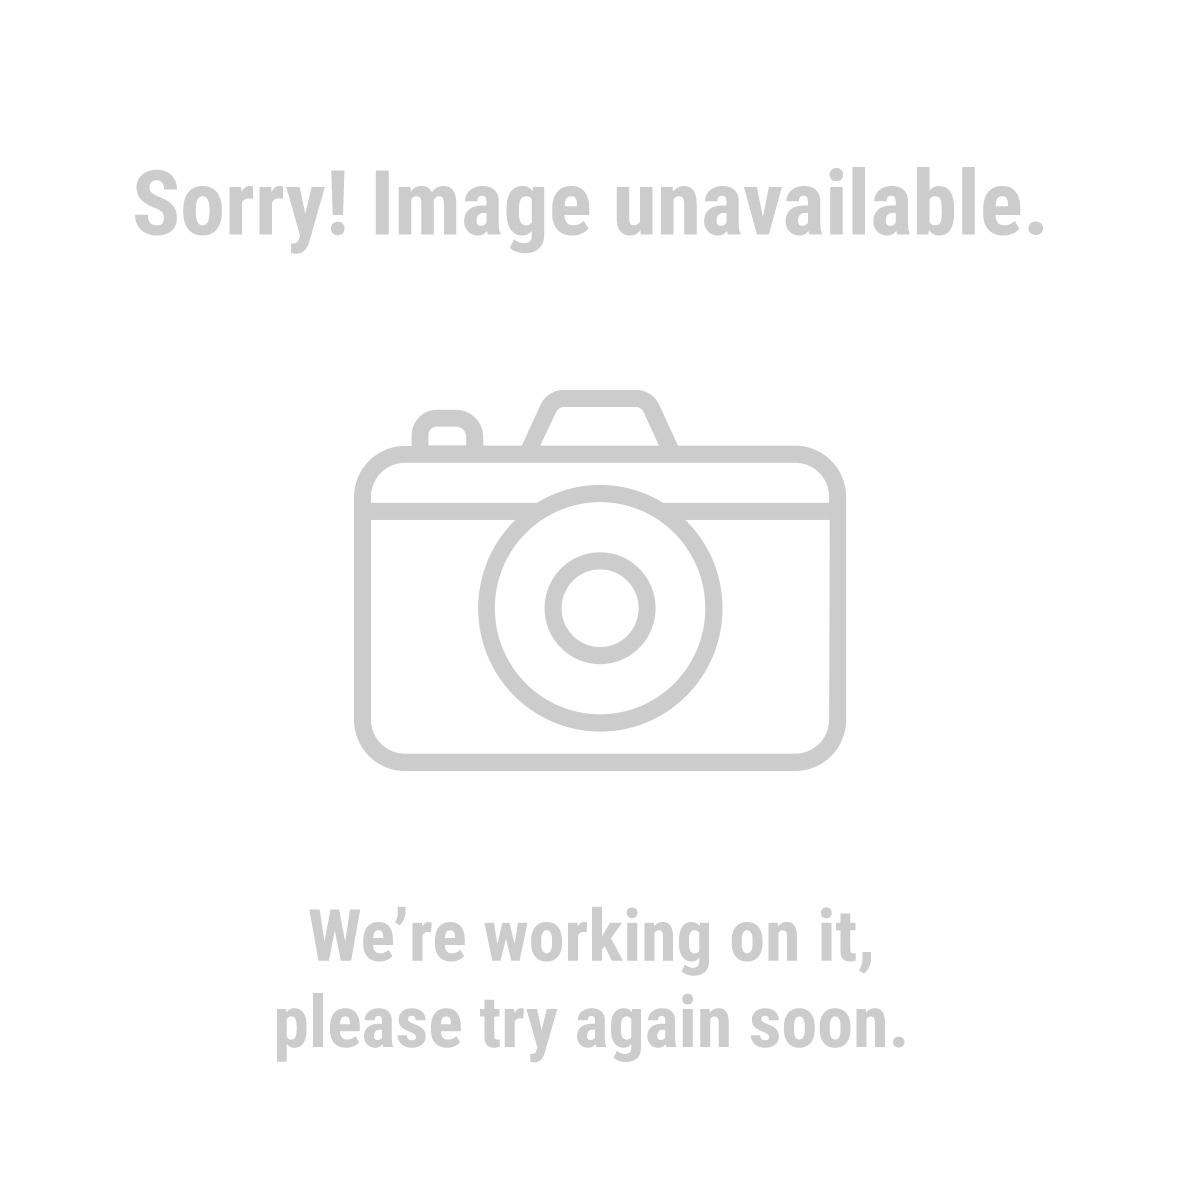 Haul-Master® 60760 23 Piece Elastic Stretch Cords